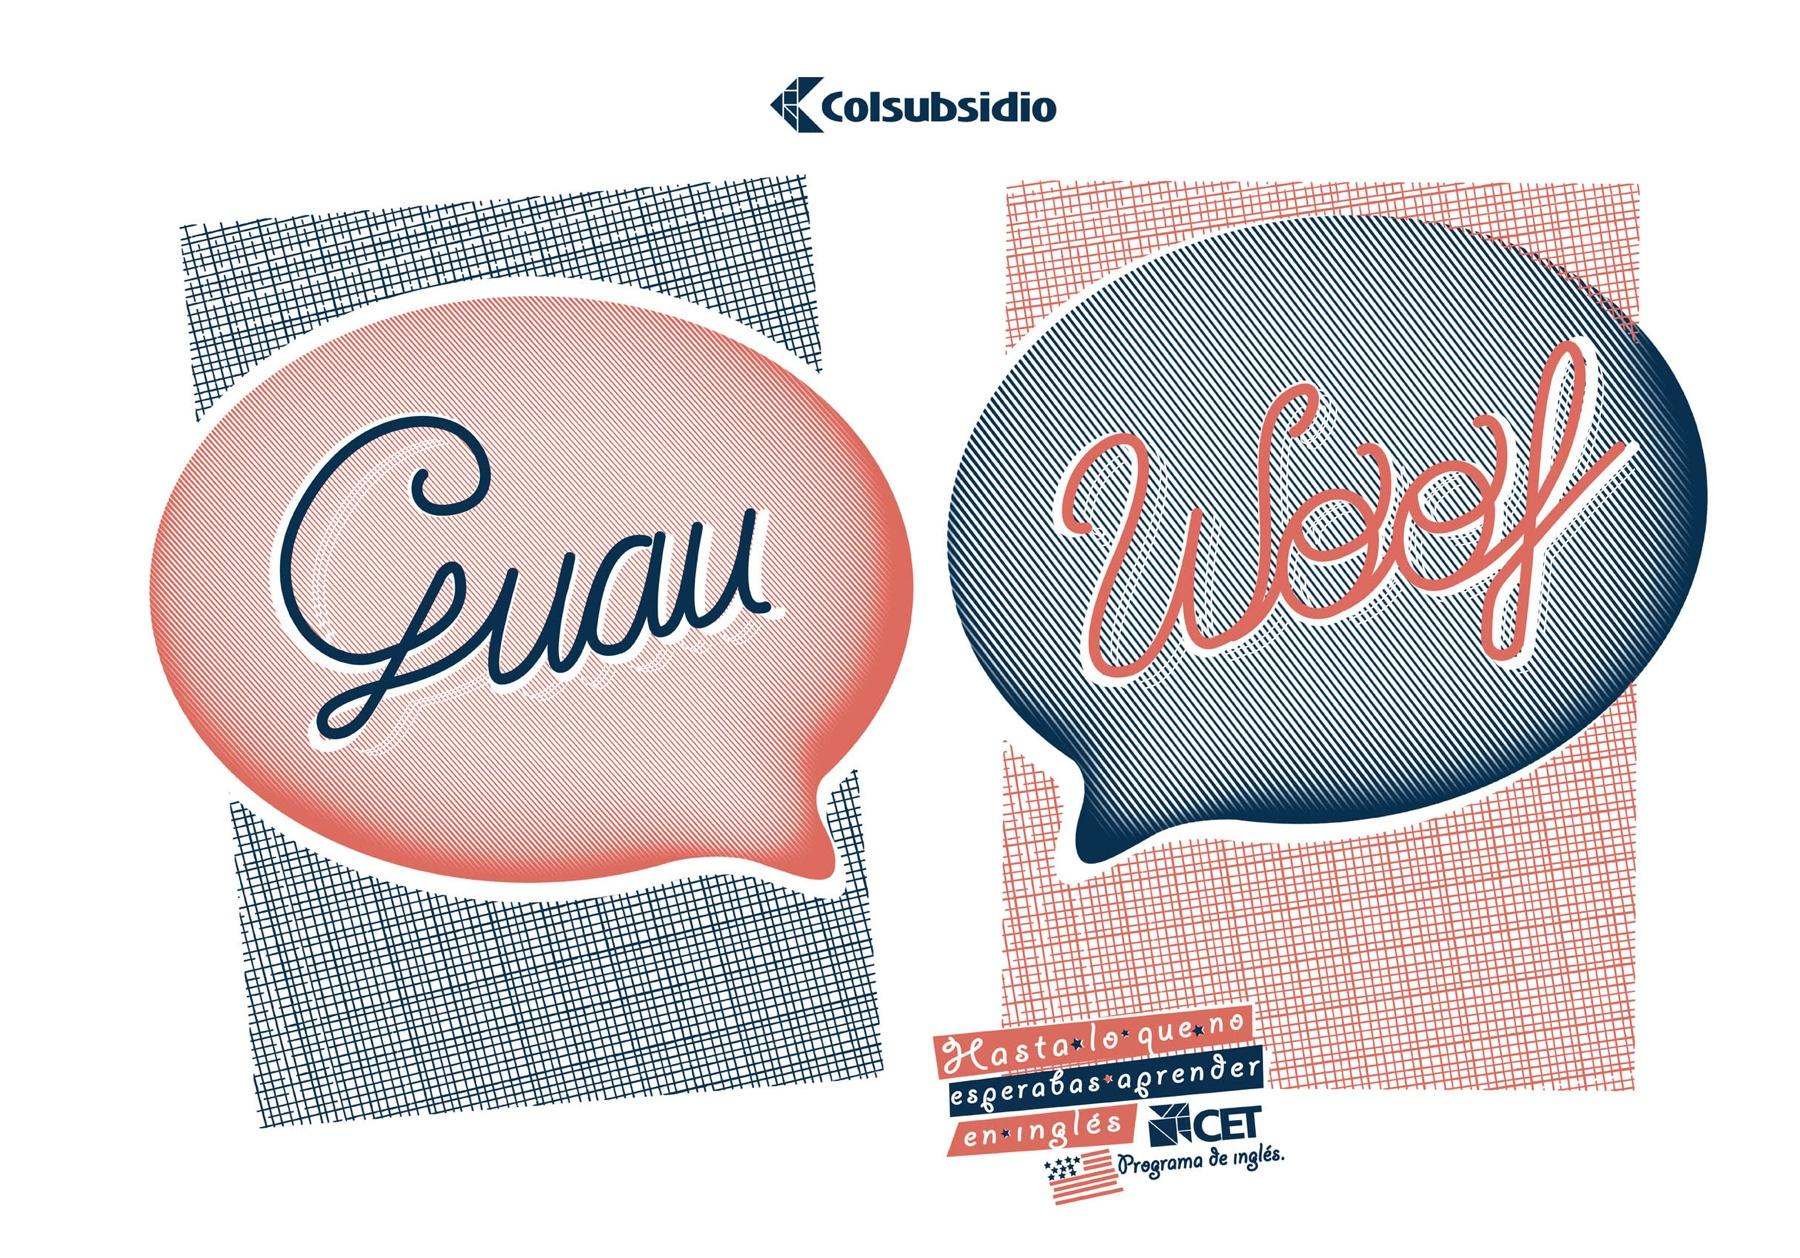 Colsubsidio Print Ad -  Woof